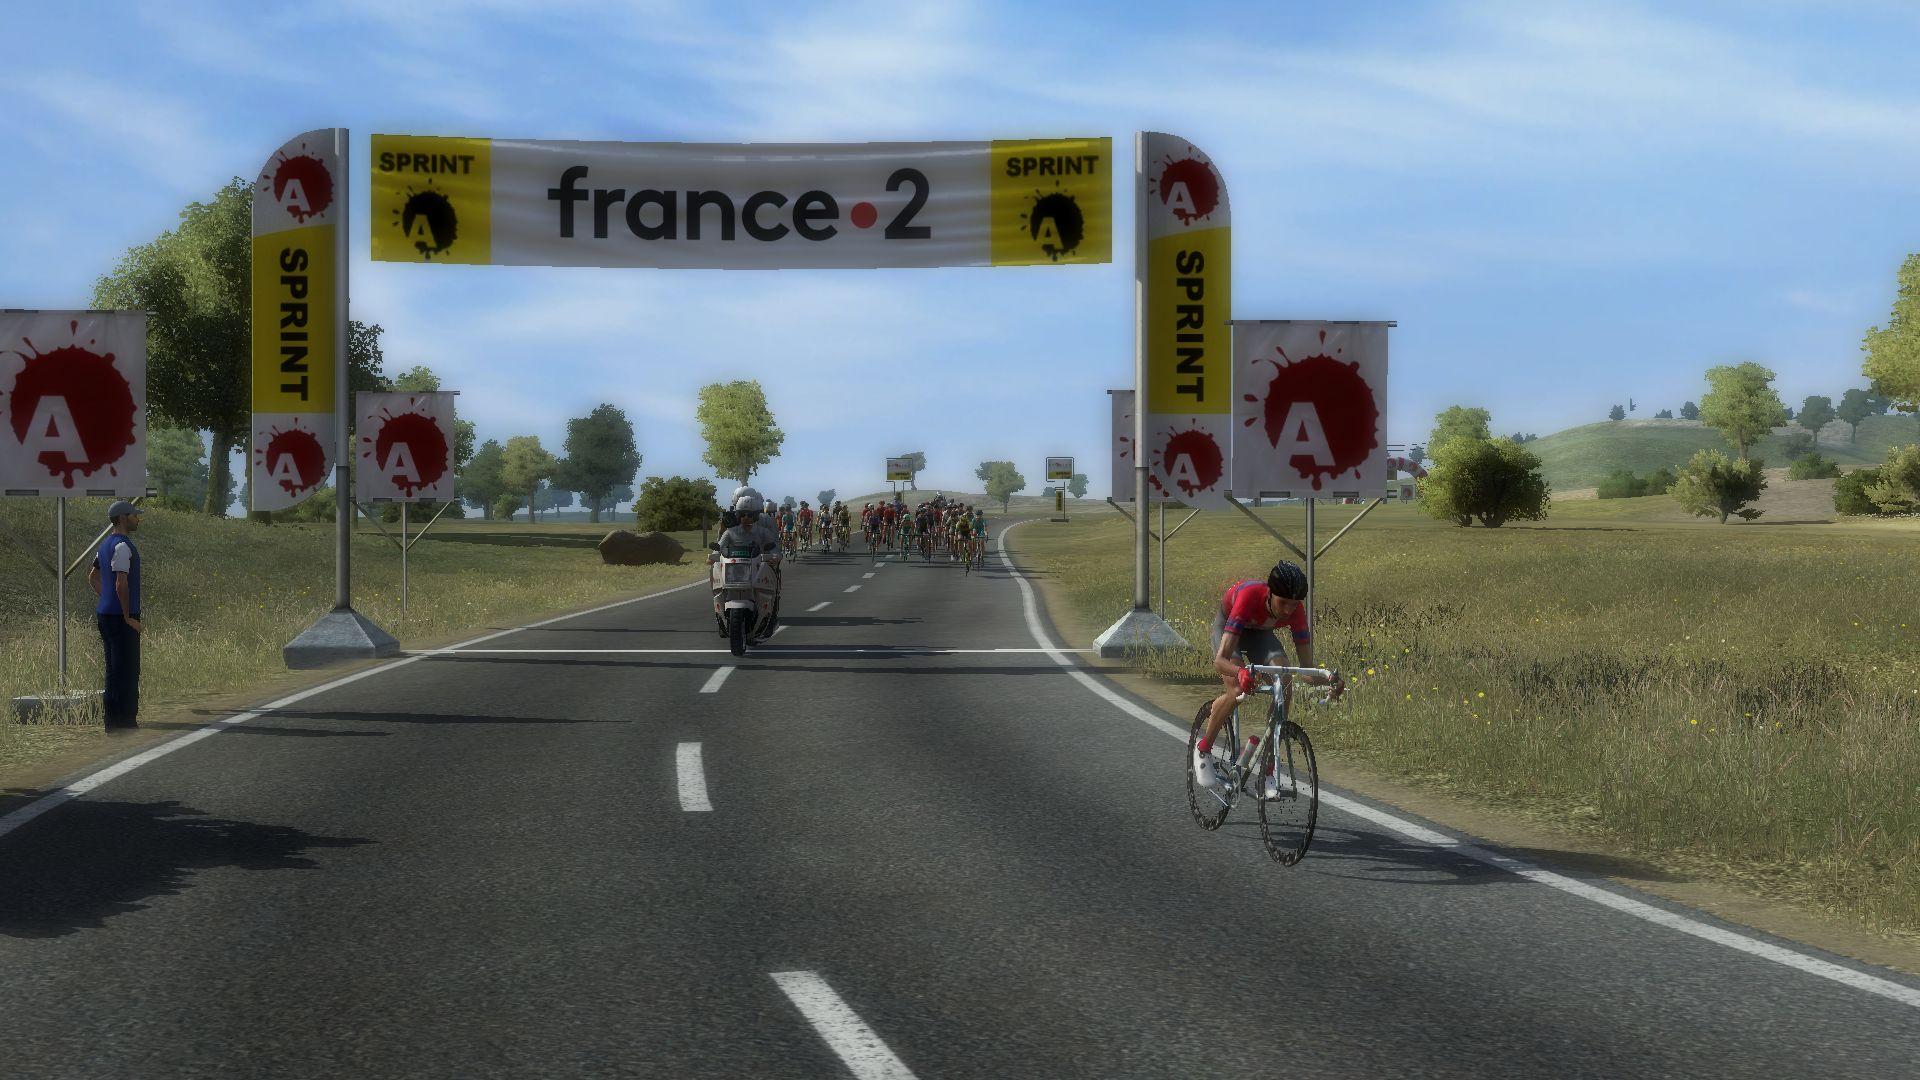 pcmdaily.com/images/mg/2020/Reports/HC/Corsica/CIS3%2014.jpg